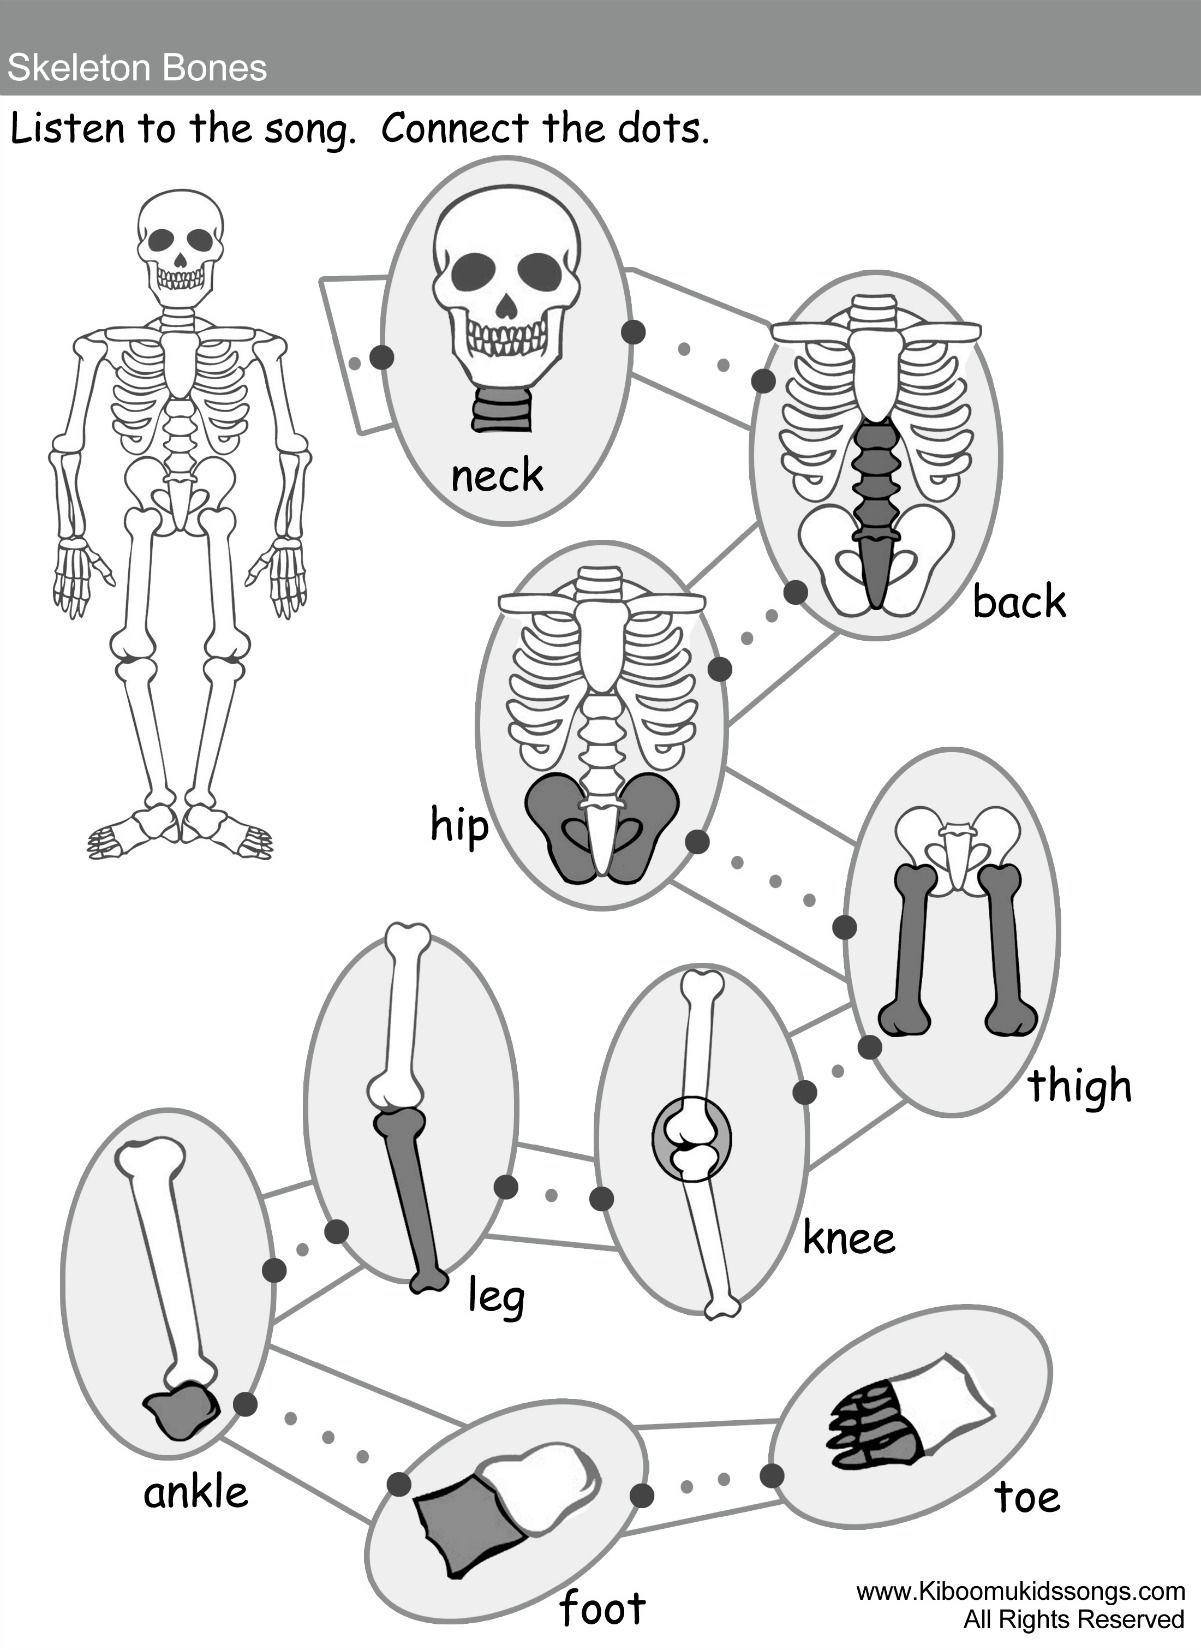 Skeleton bones song and worksheets   Human body worksheets [ 1650 x 1201 Pixel ]